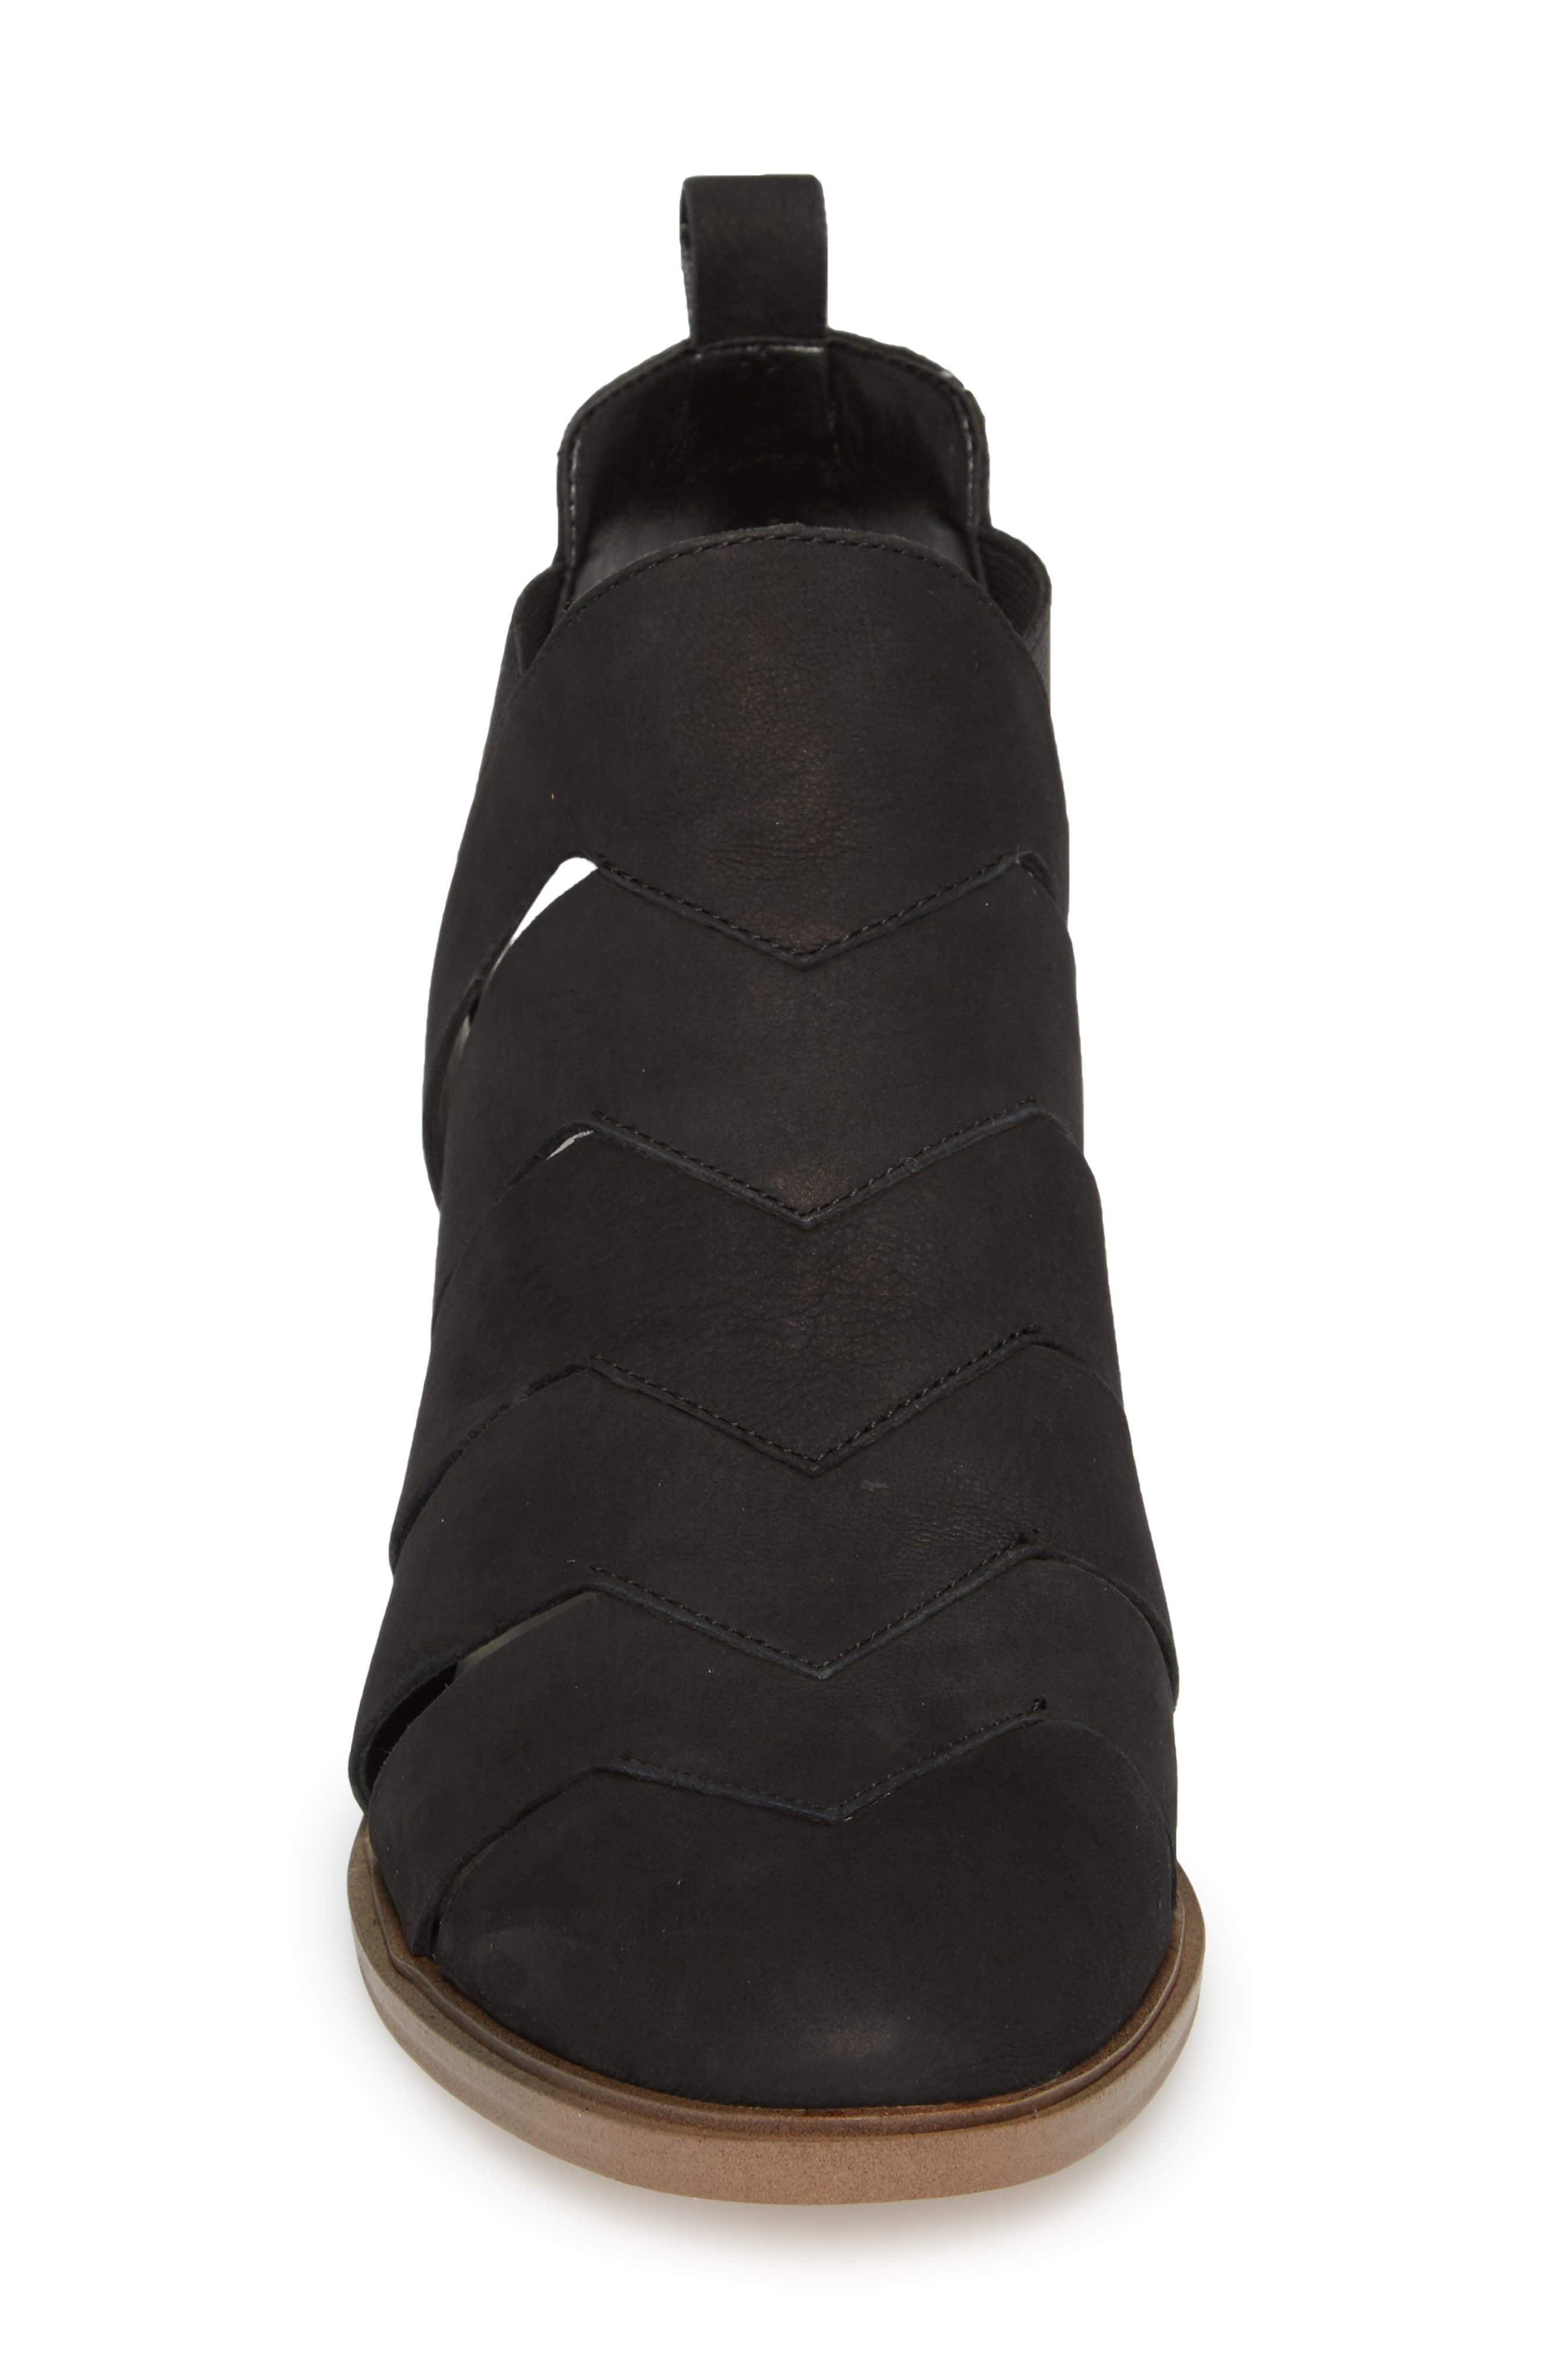 Amilee Bootie,                             Alternate thumbnail 4, color,                             Black Nubuck Leather